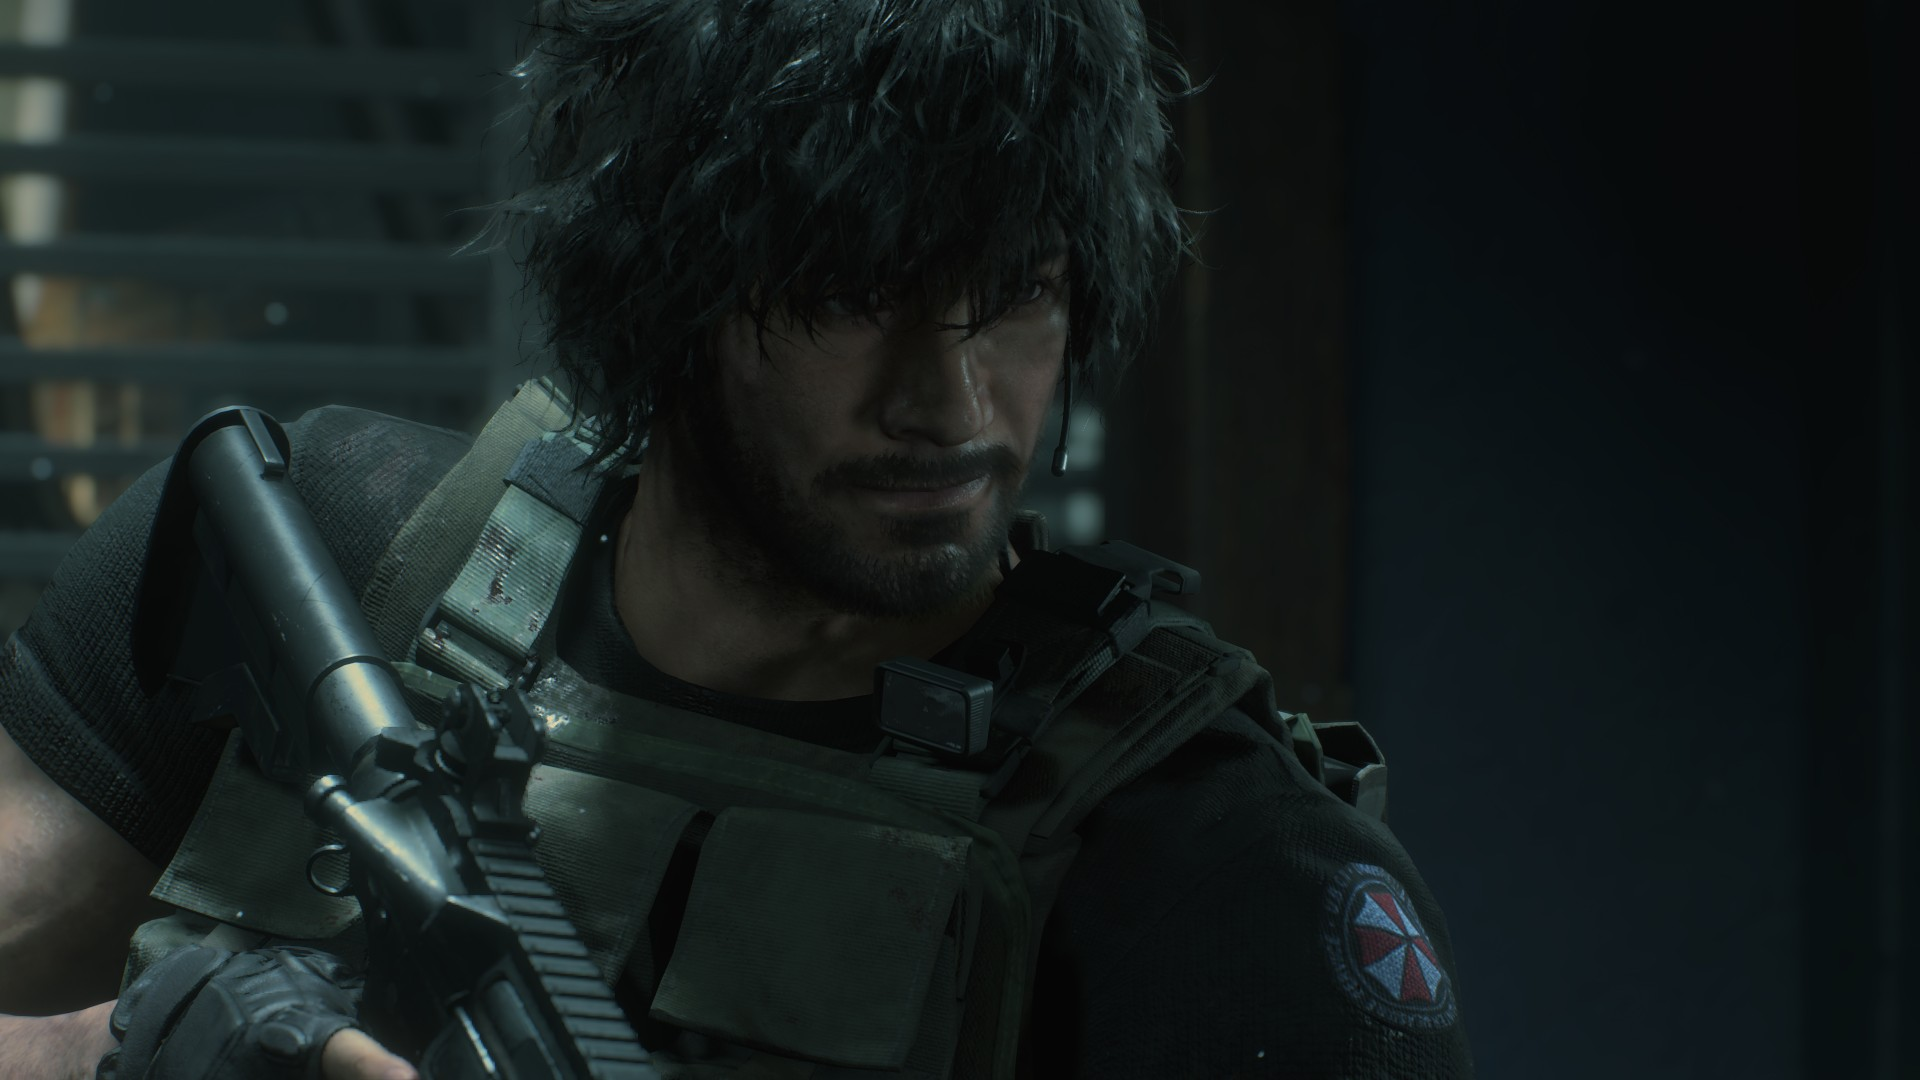 Resident Evil 3 drops Mercenaries mode, expands Carlos Oliveira's role - VG247